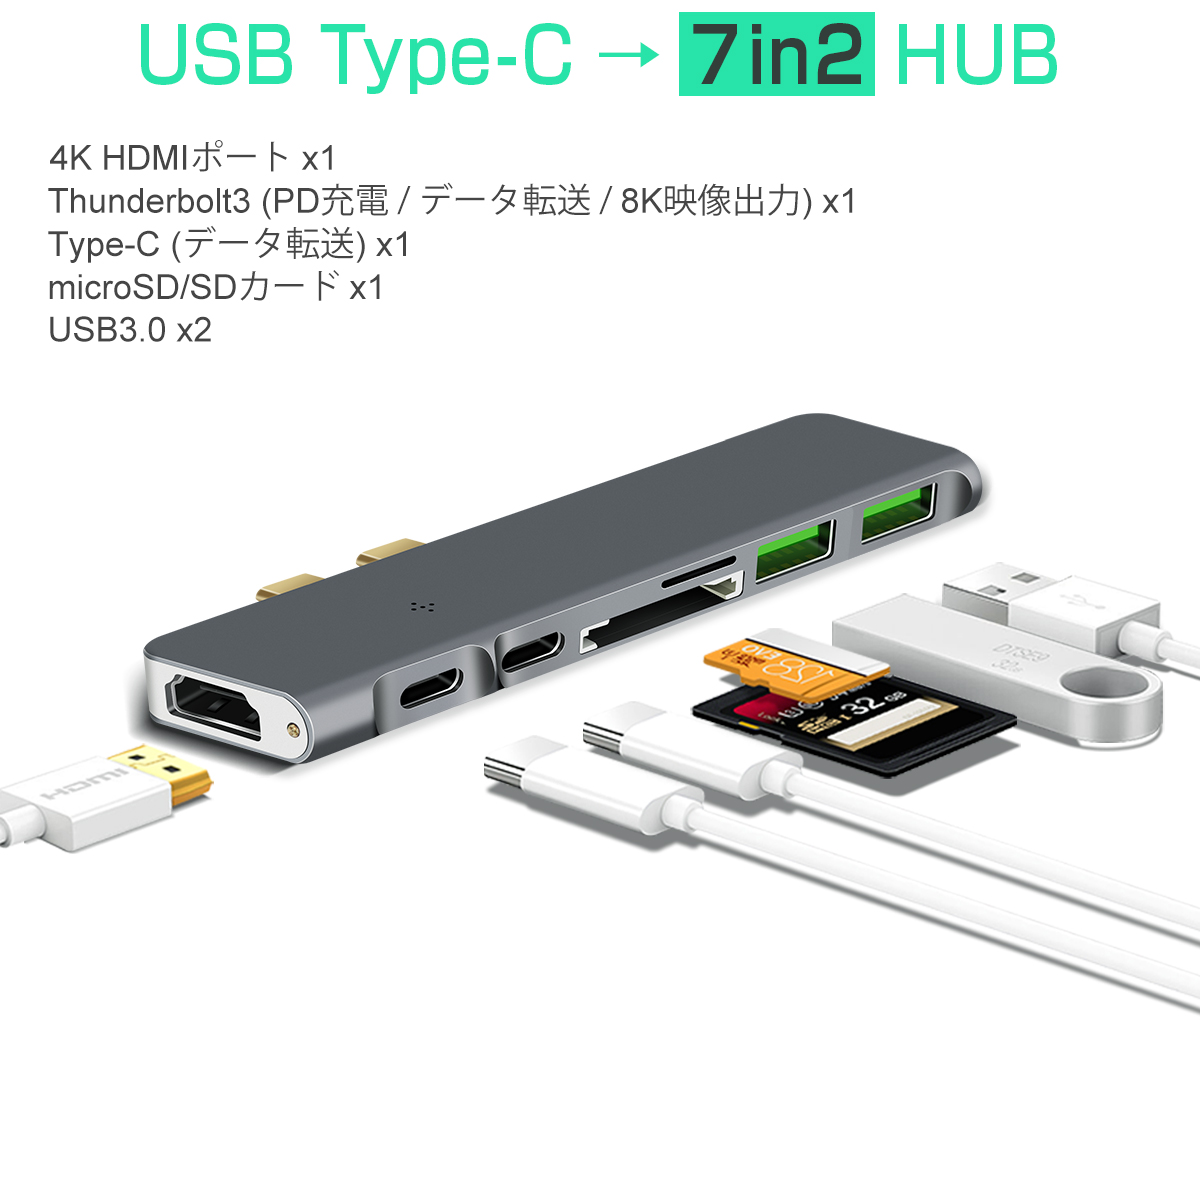 USB Type-C ハブ 7in1 USB3.0x2 4K 8K出力 HDMI Thunderbolt3 40Gbps PD充電 microSD SDスロット 拡張 変換 スペースグレイ MacBookに馴染むデザイン設計 SDM便送料無料 3ヶ月保証